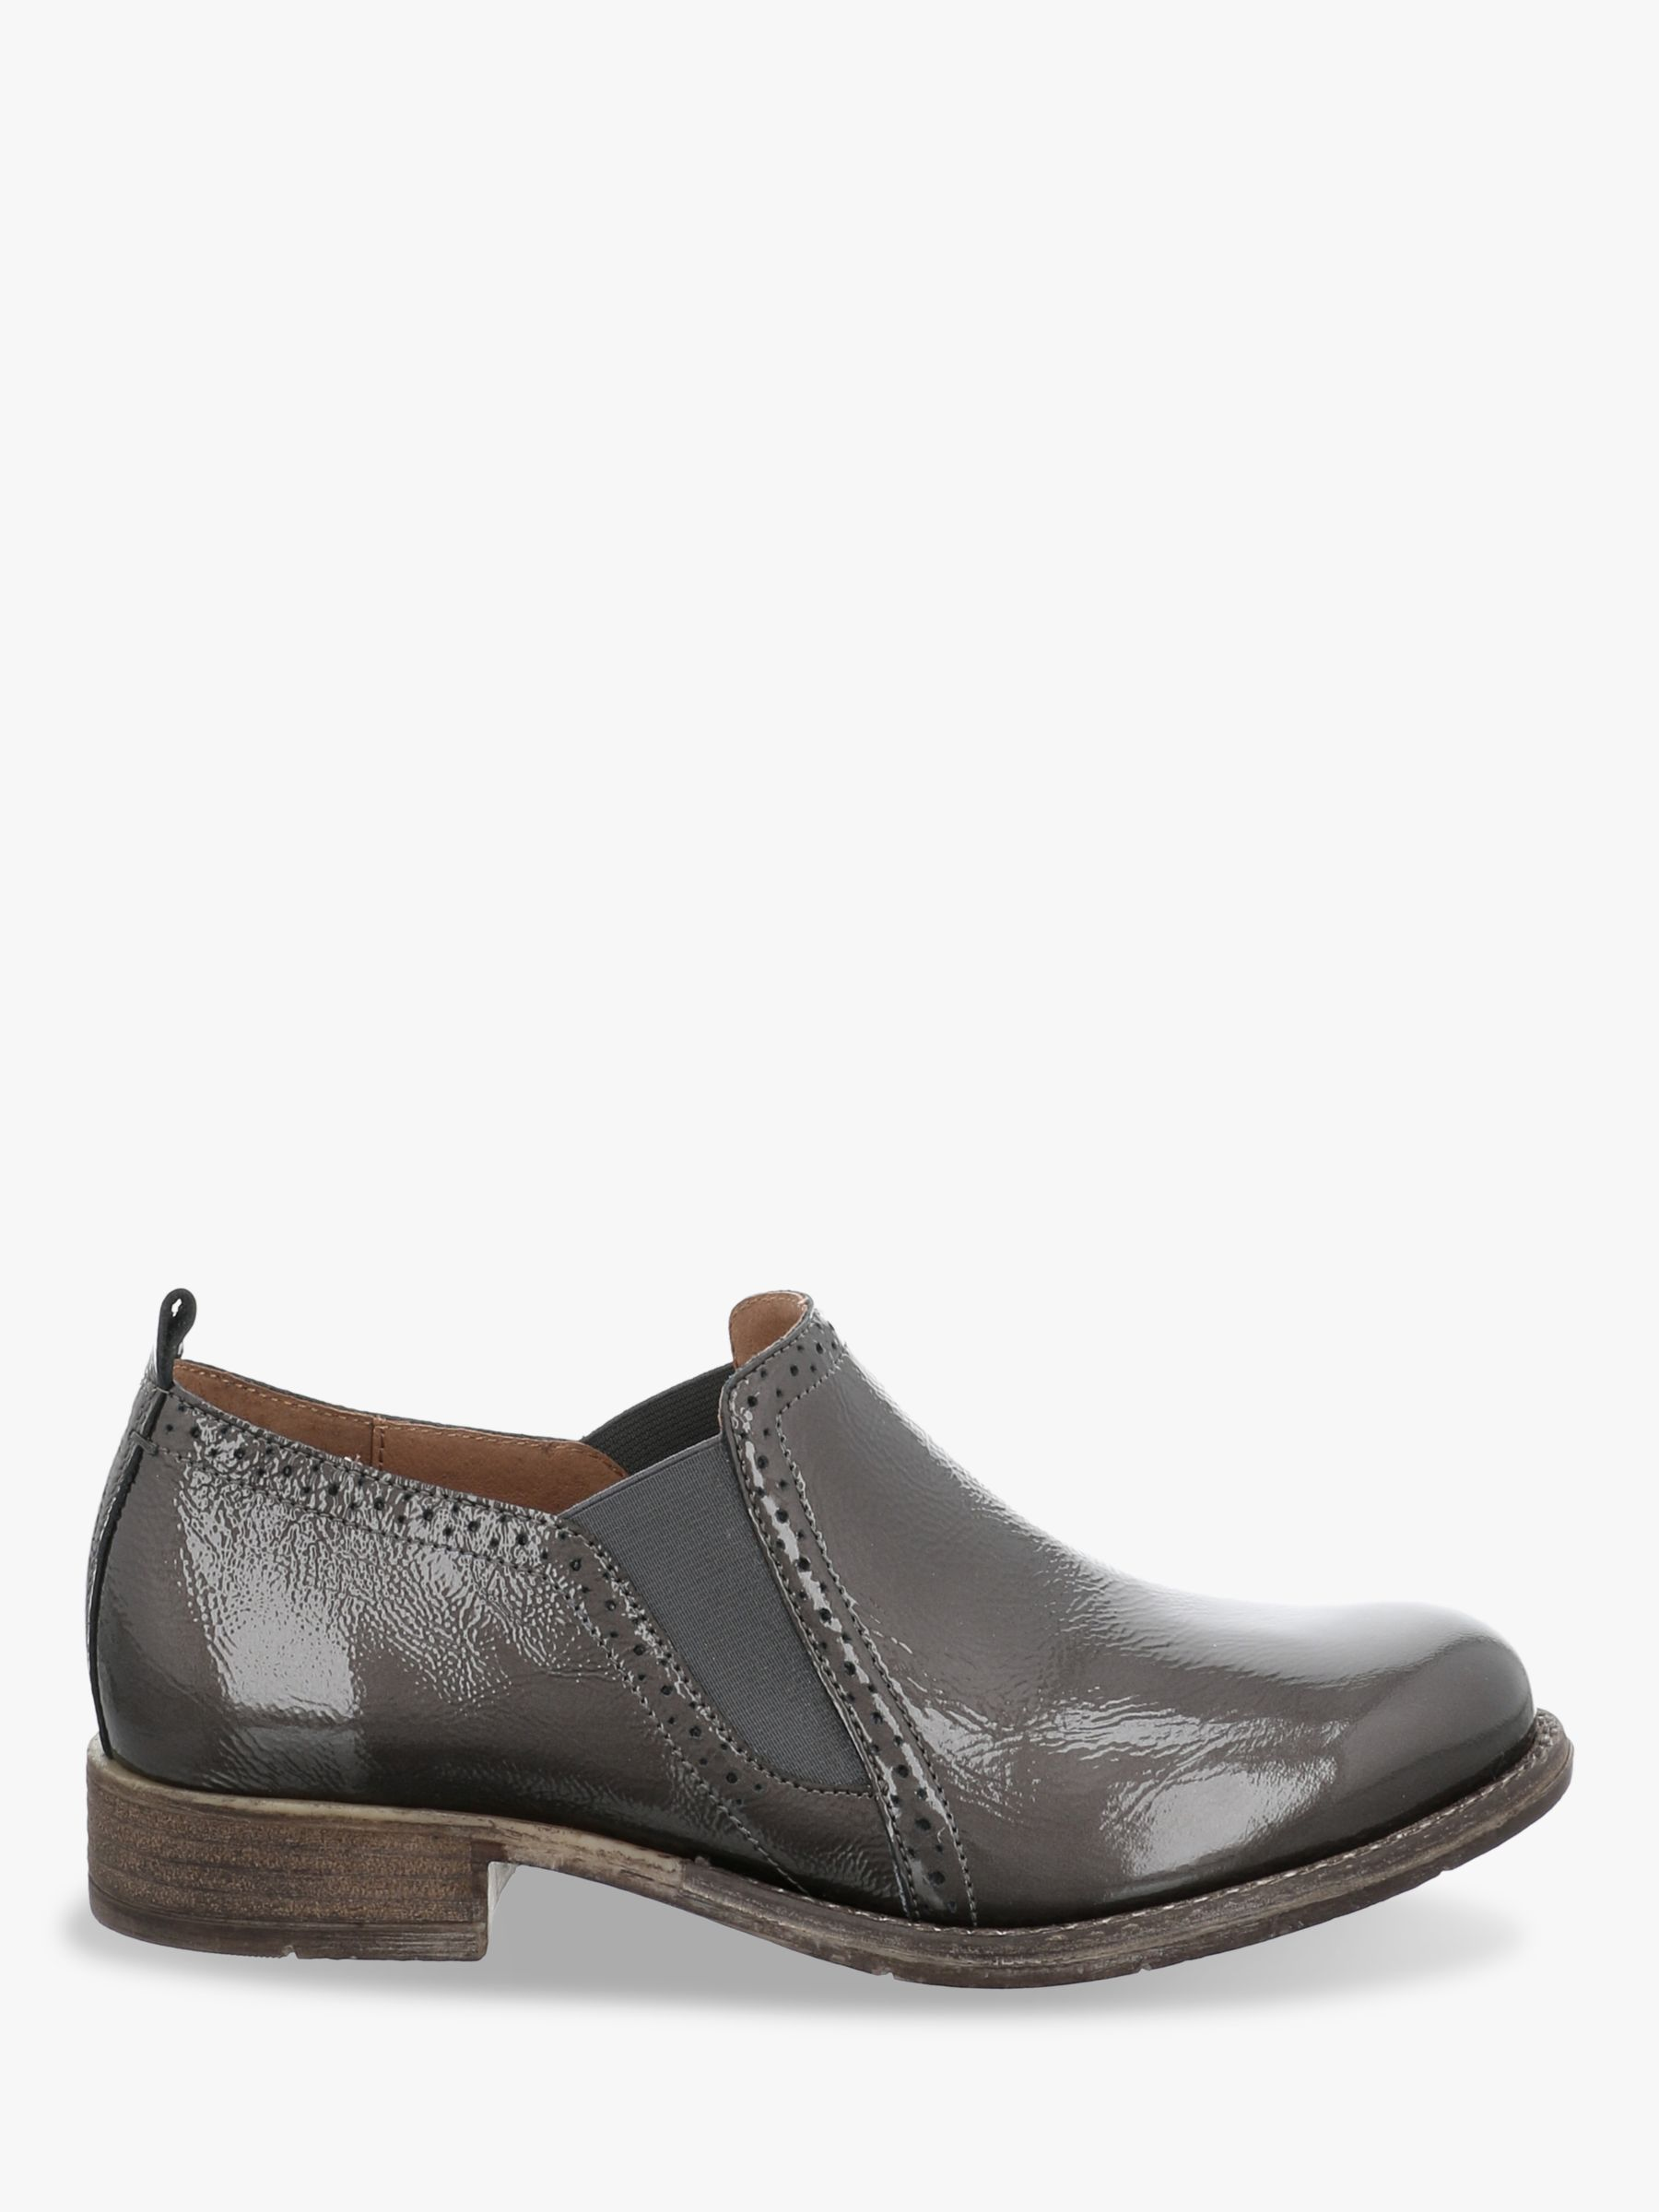 Josef Seibel Josef Seibel Sienna 91 Leather Brogues, Grey